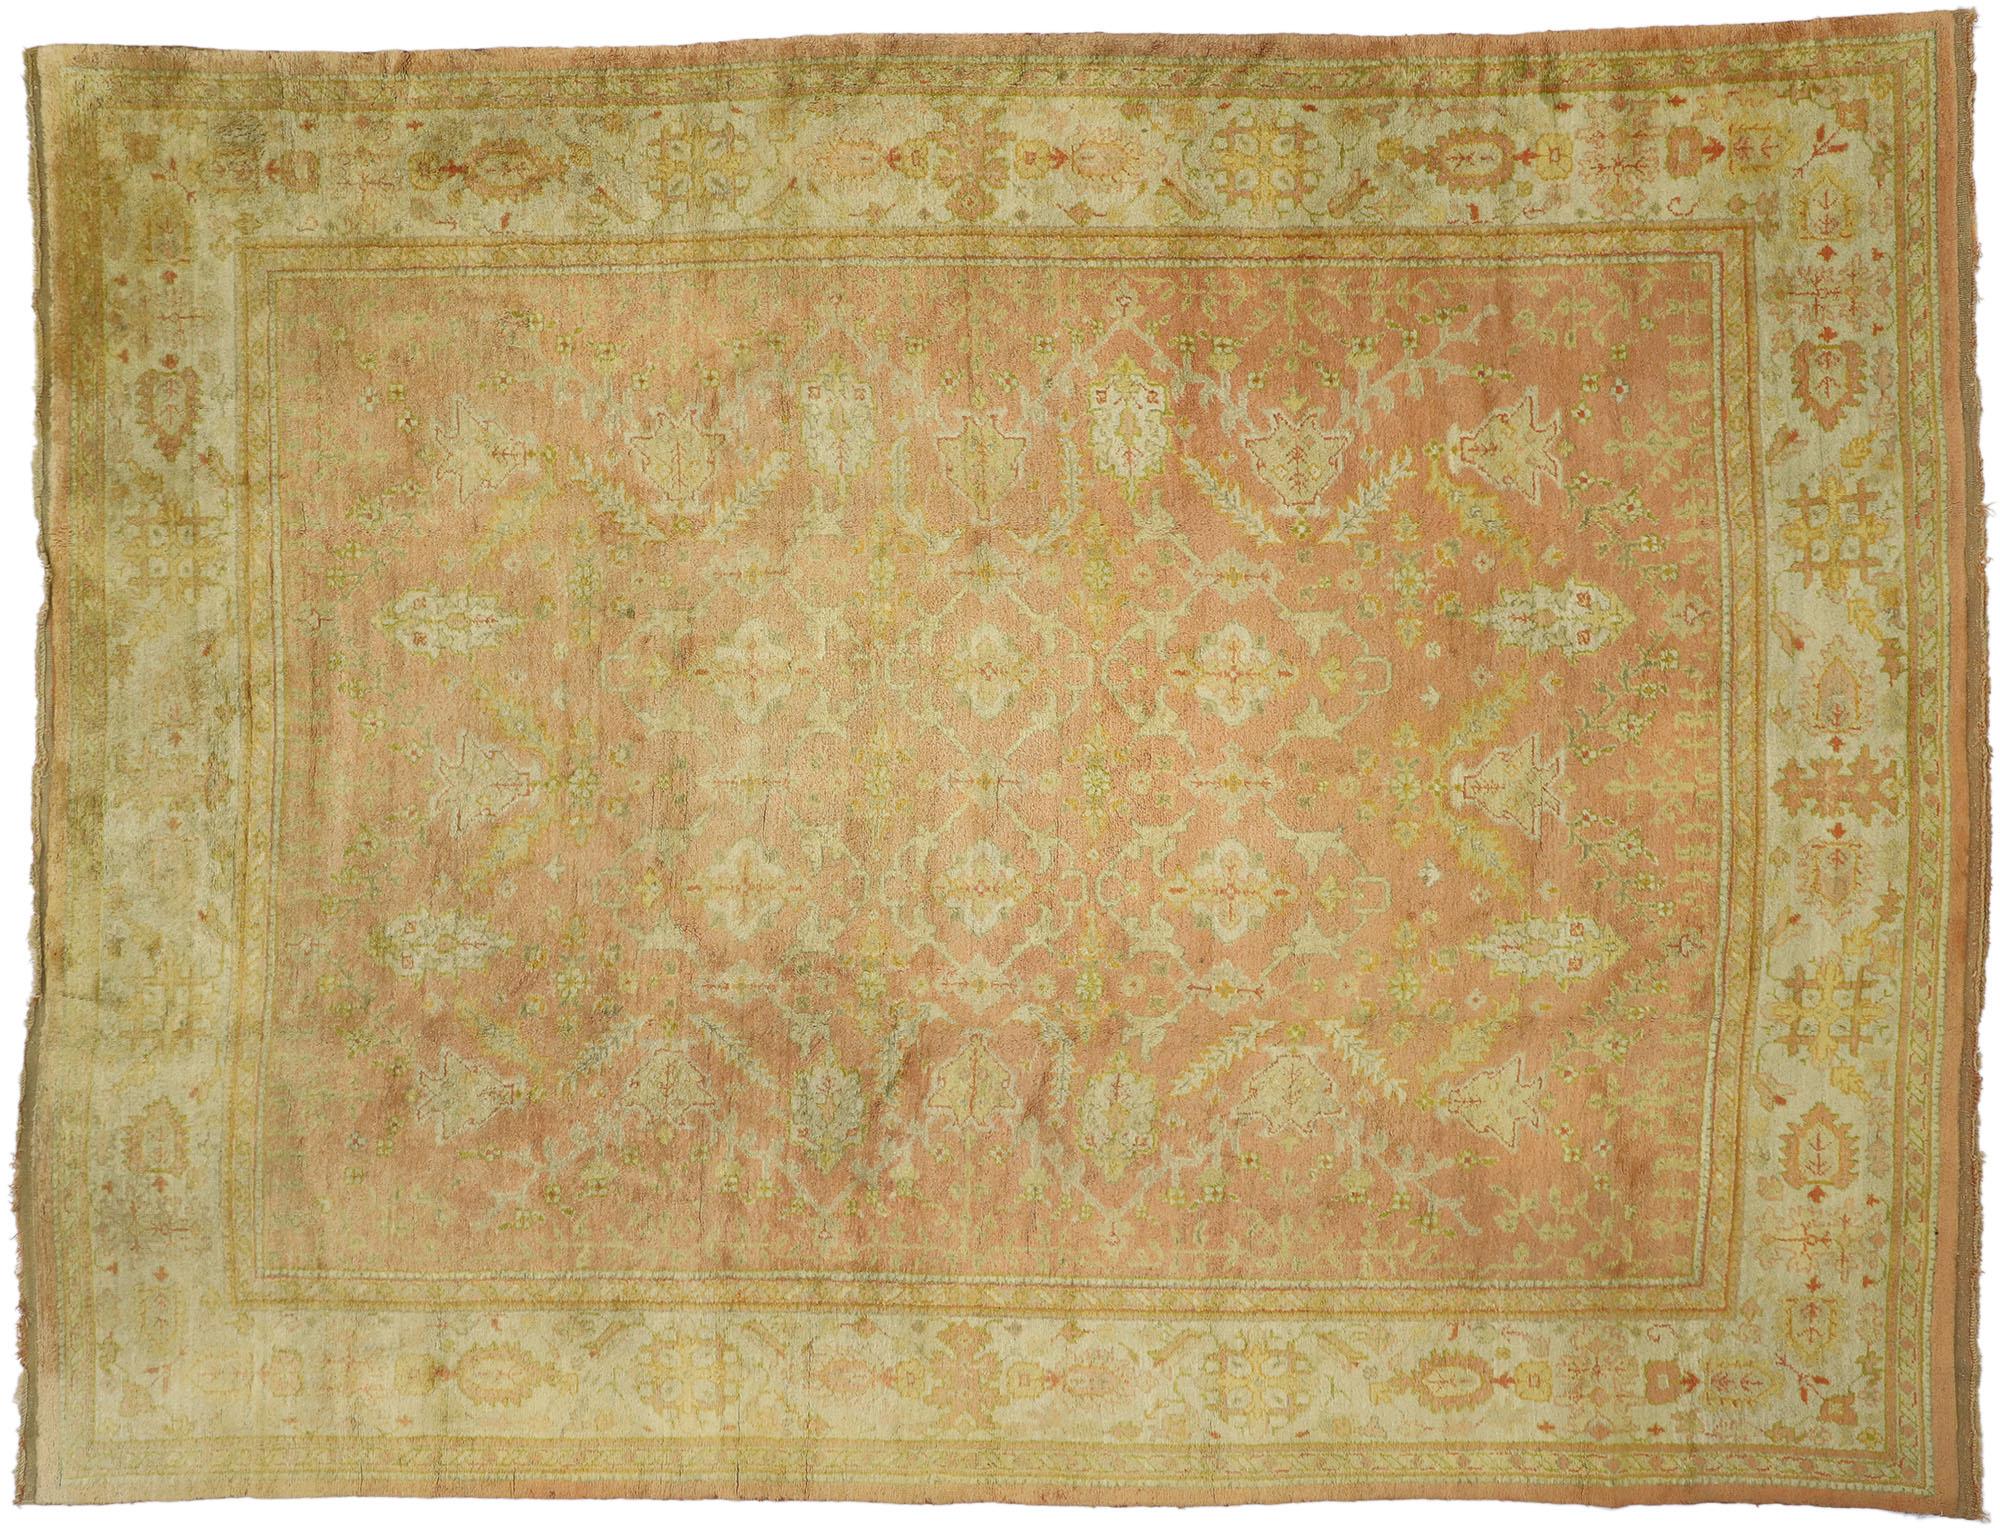 Antique Oushak Oriental Rug 9 x 12